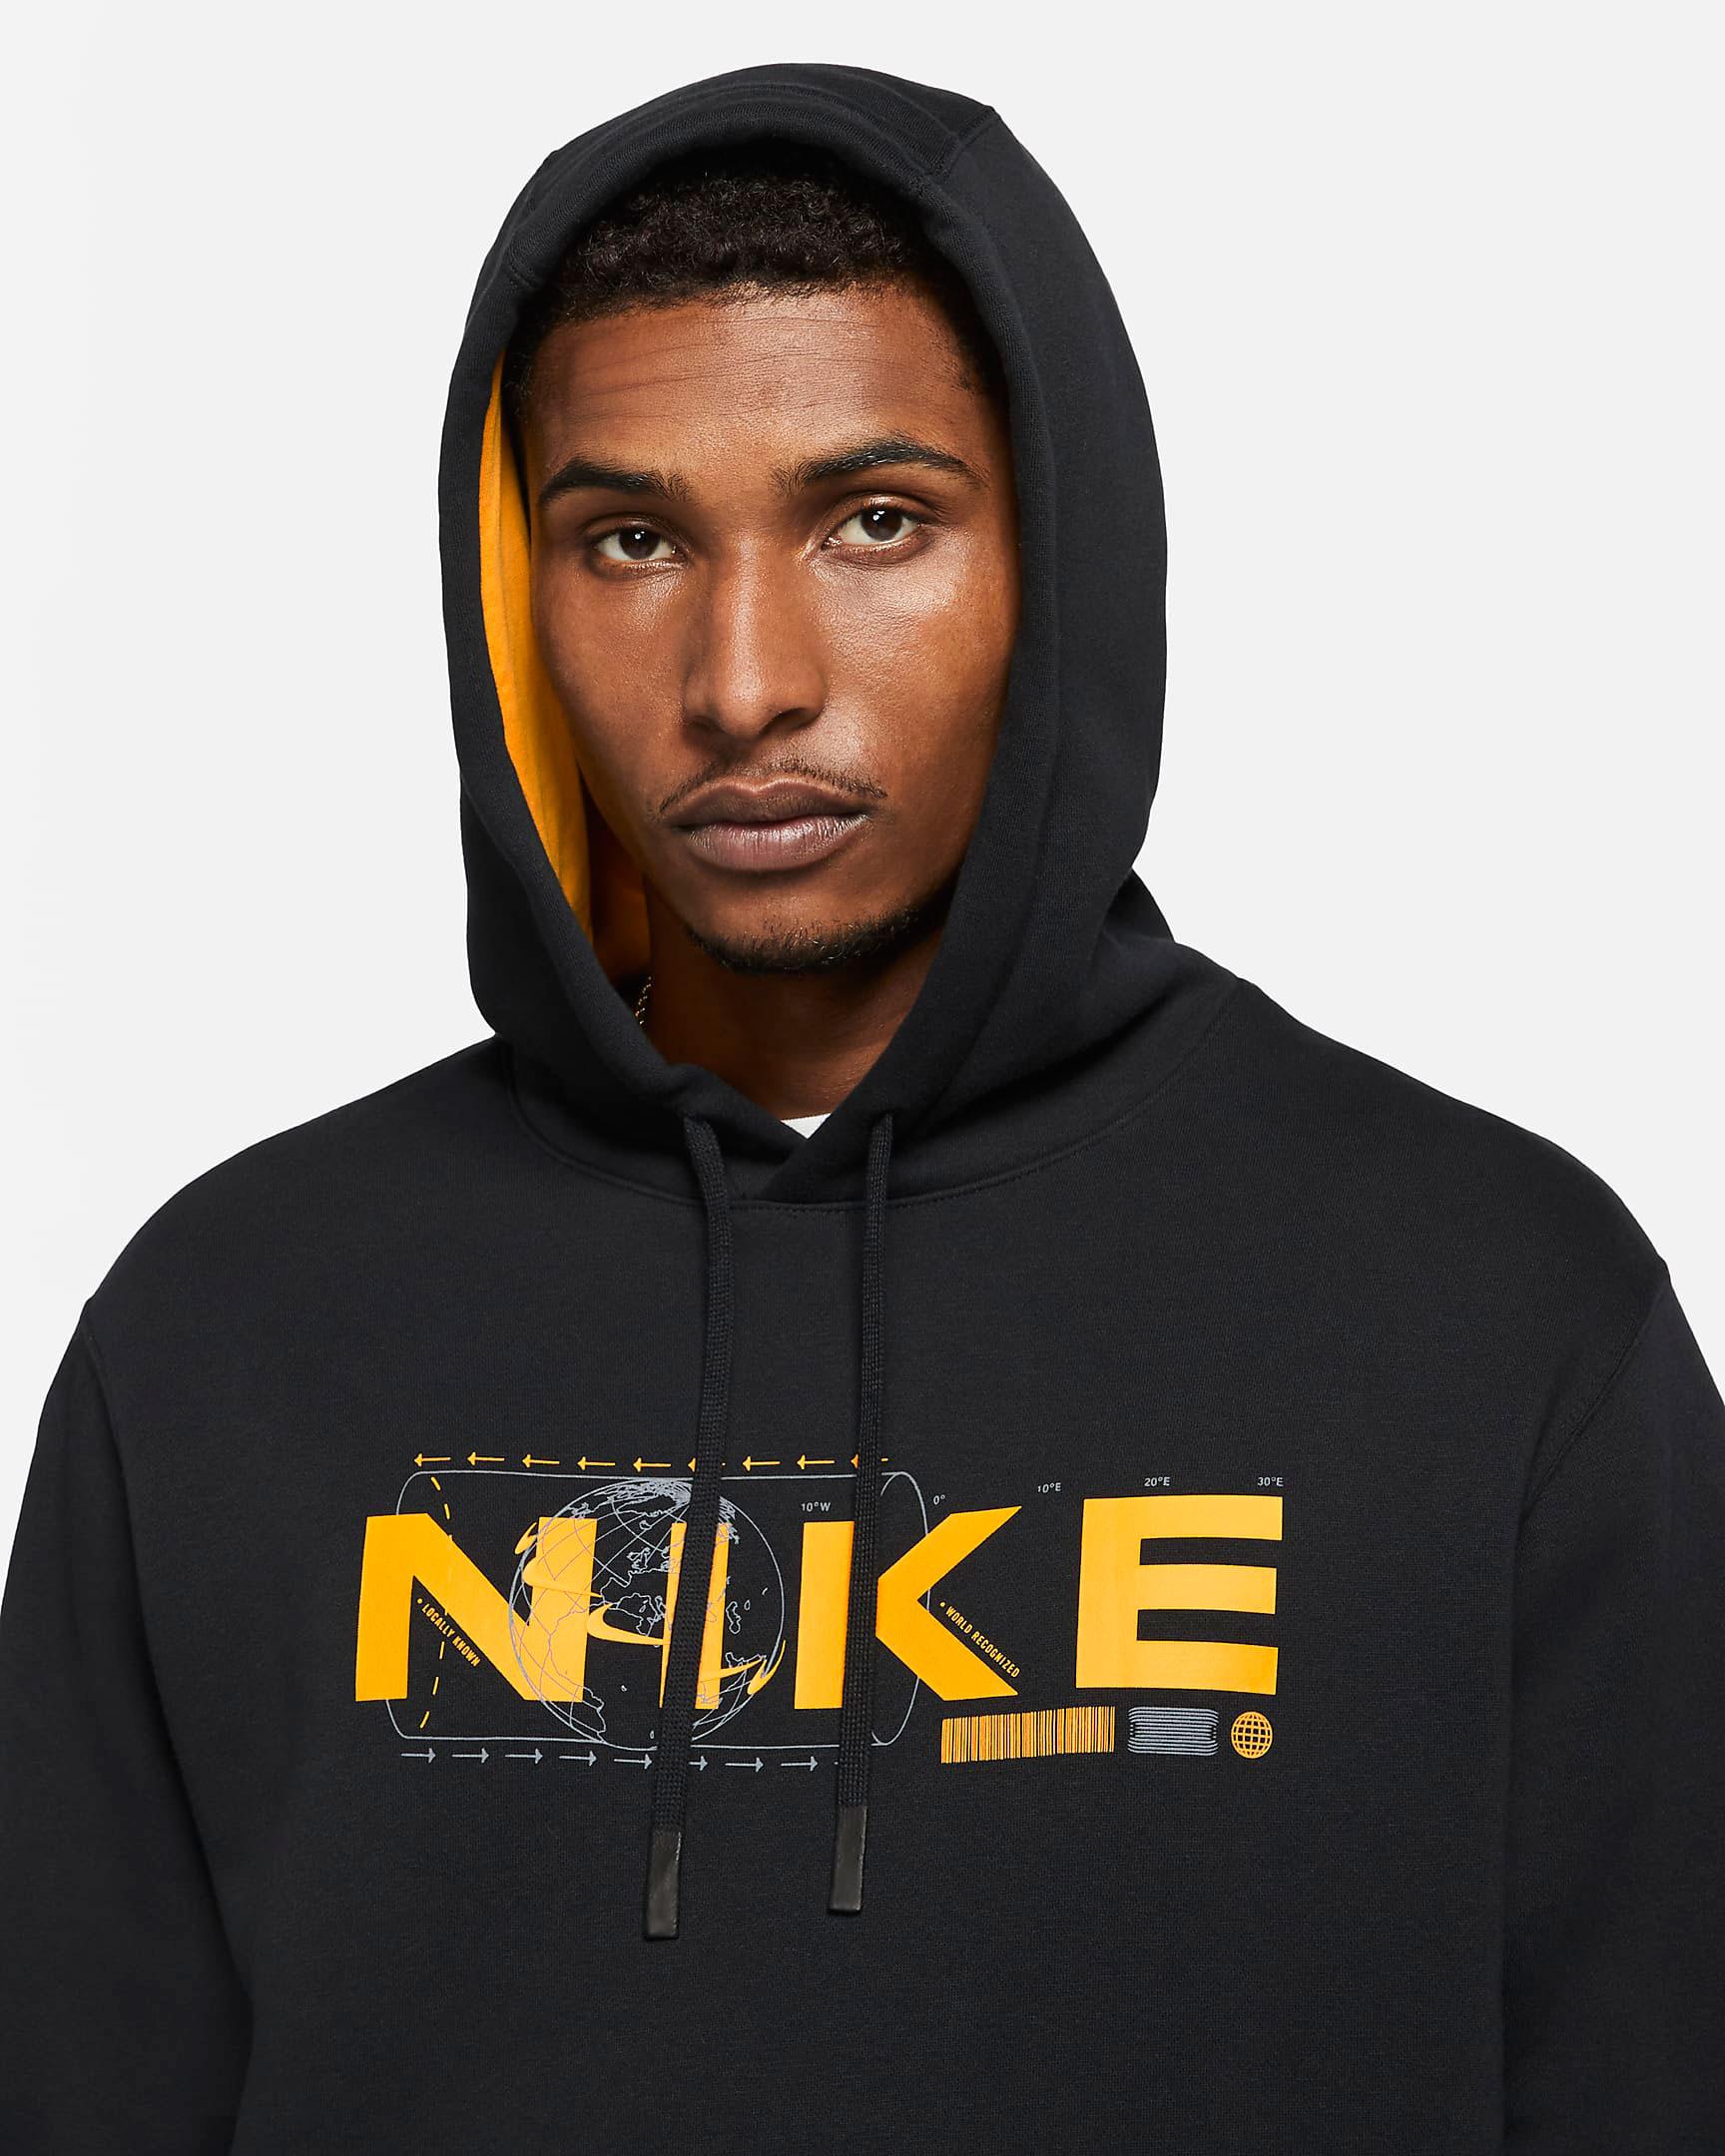 jordan-9-university-gold-nike-hoodie-6